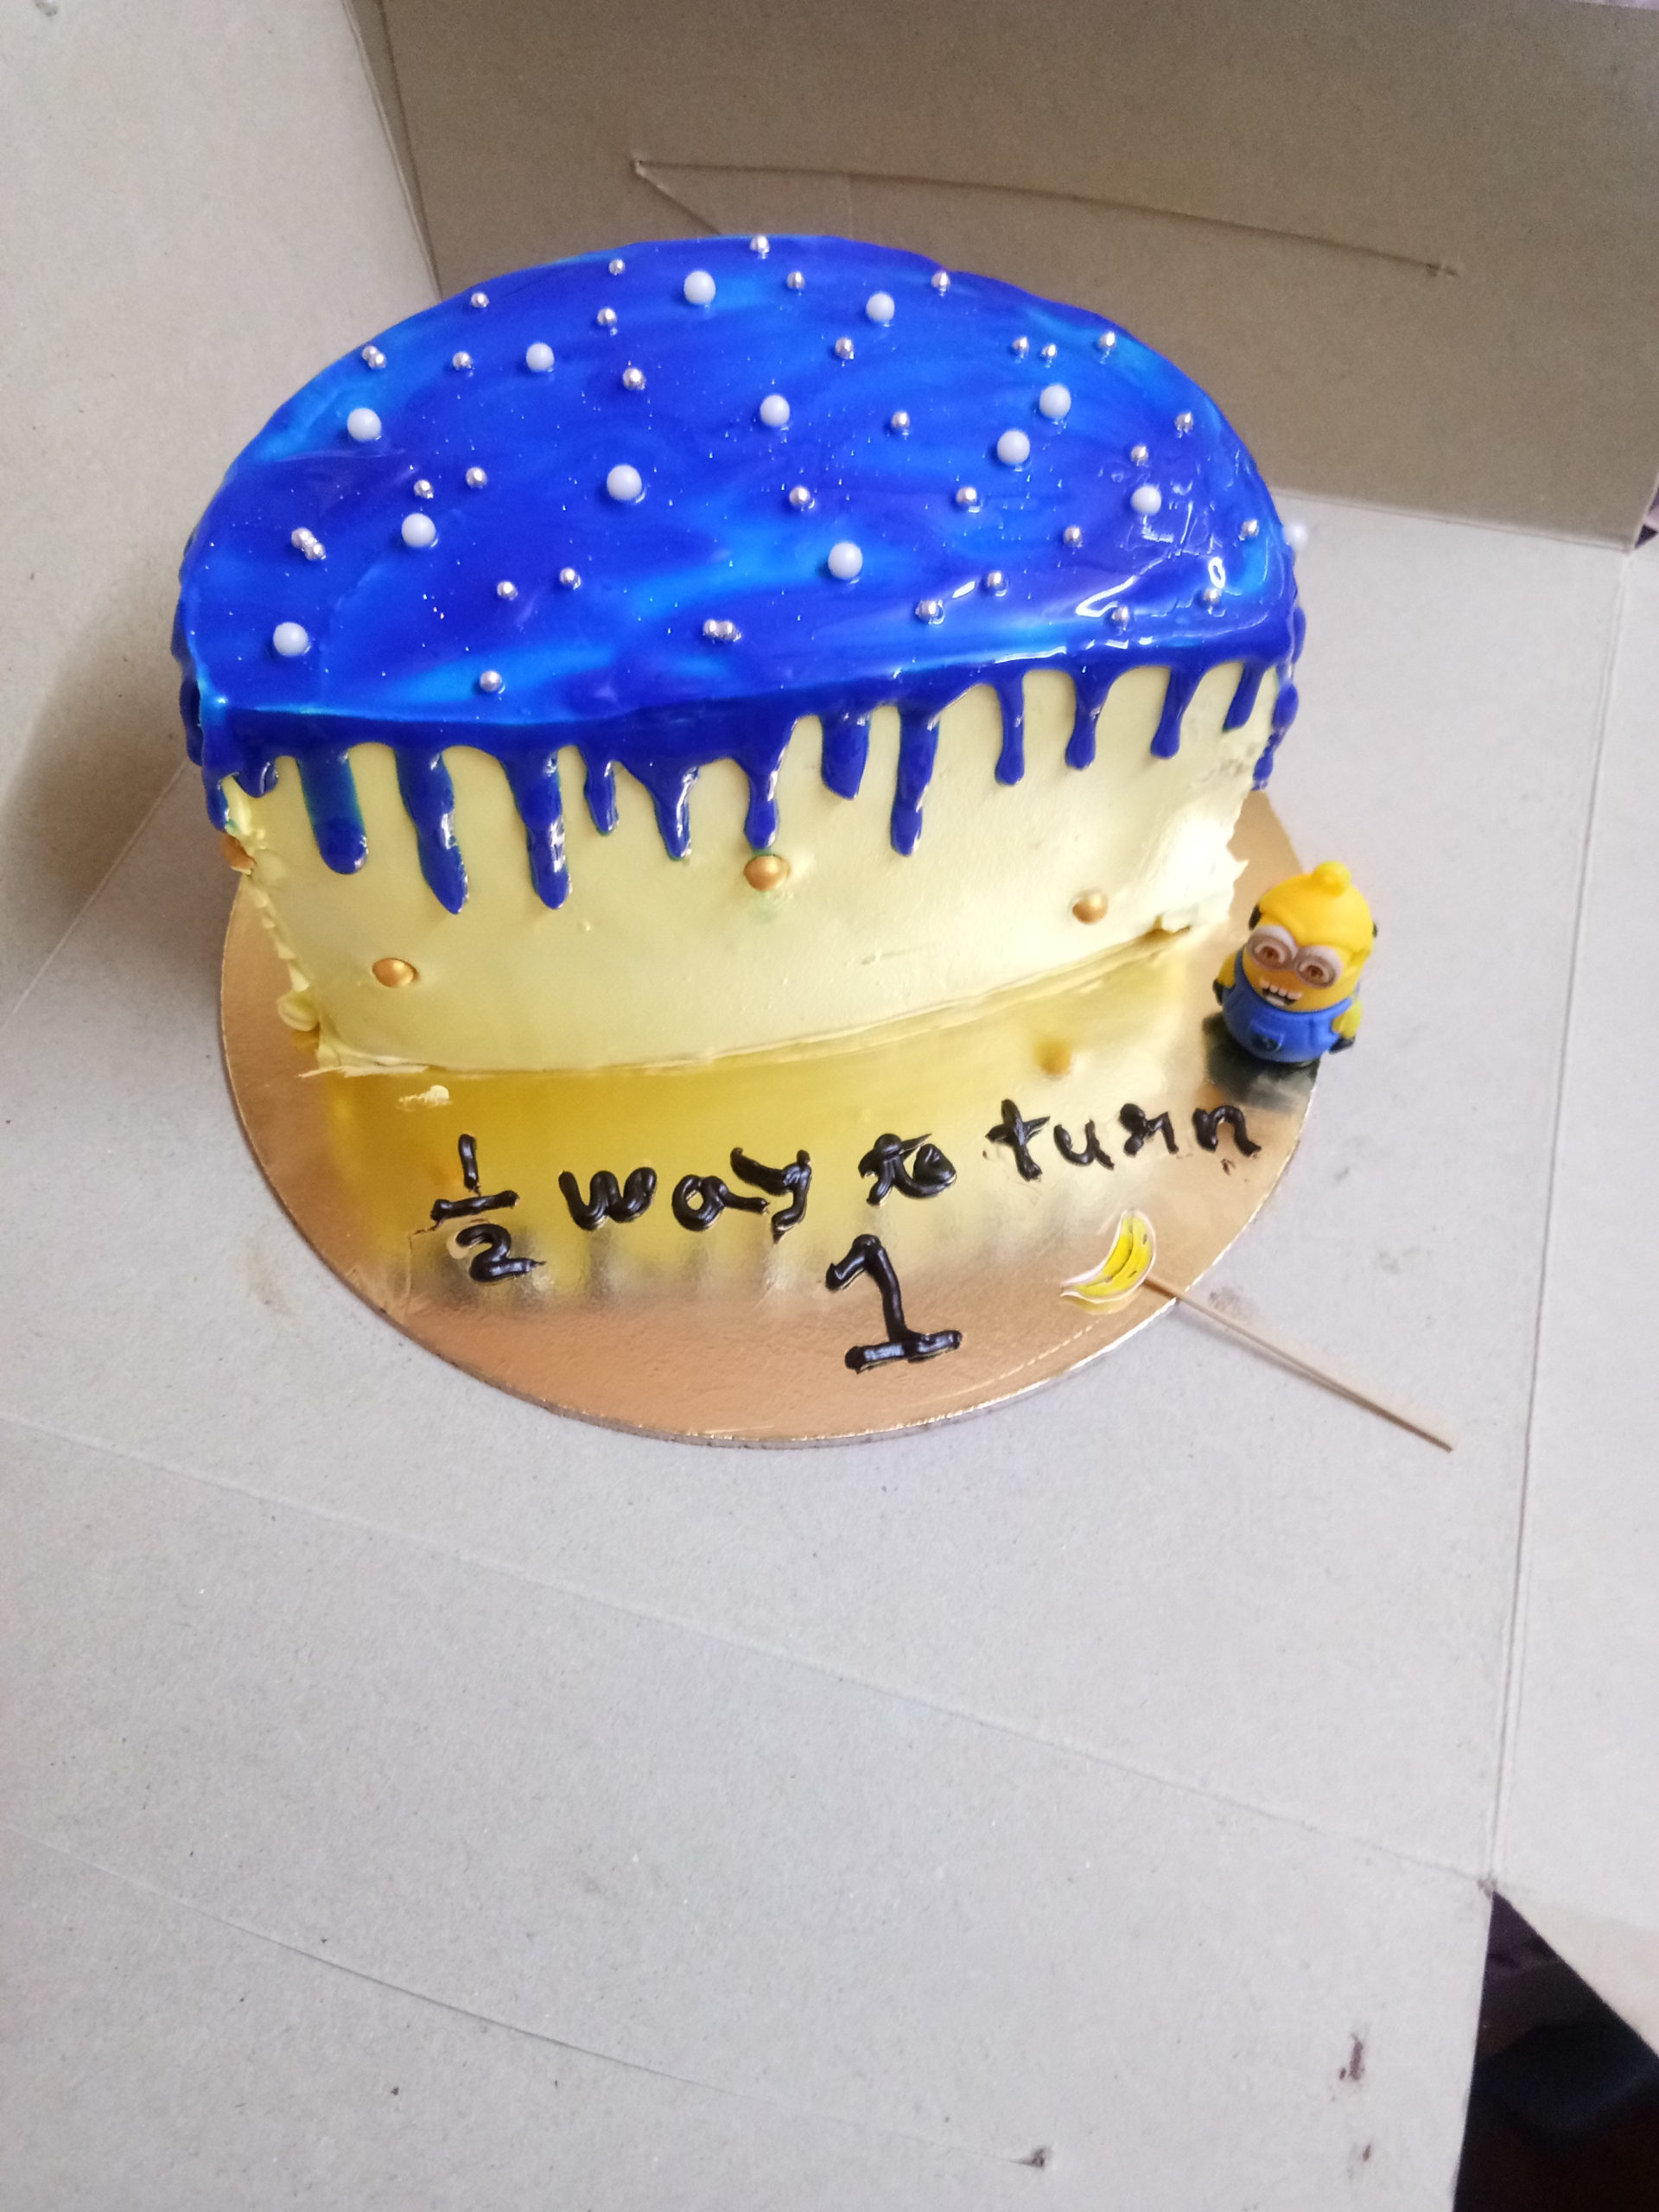 Half Year Birthday Cake Designs, Images, Price Near Me